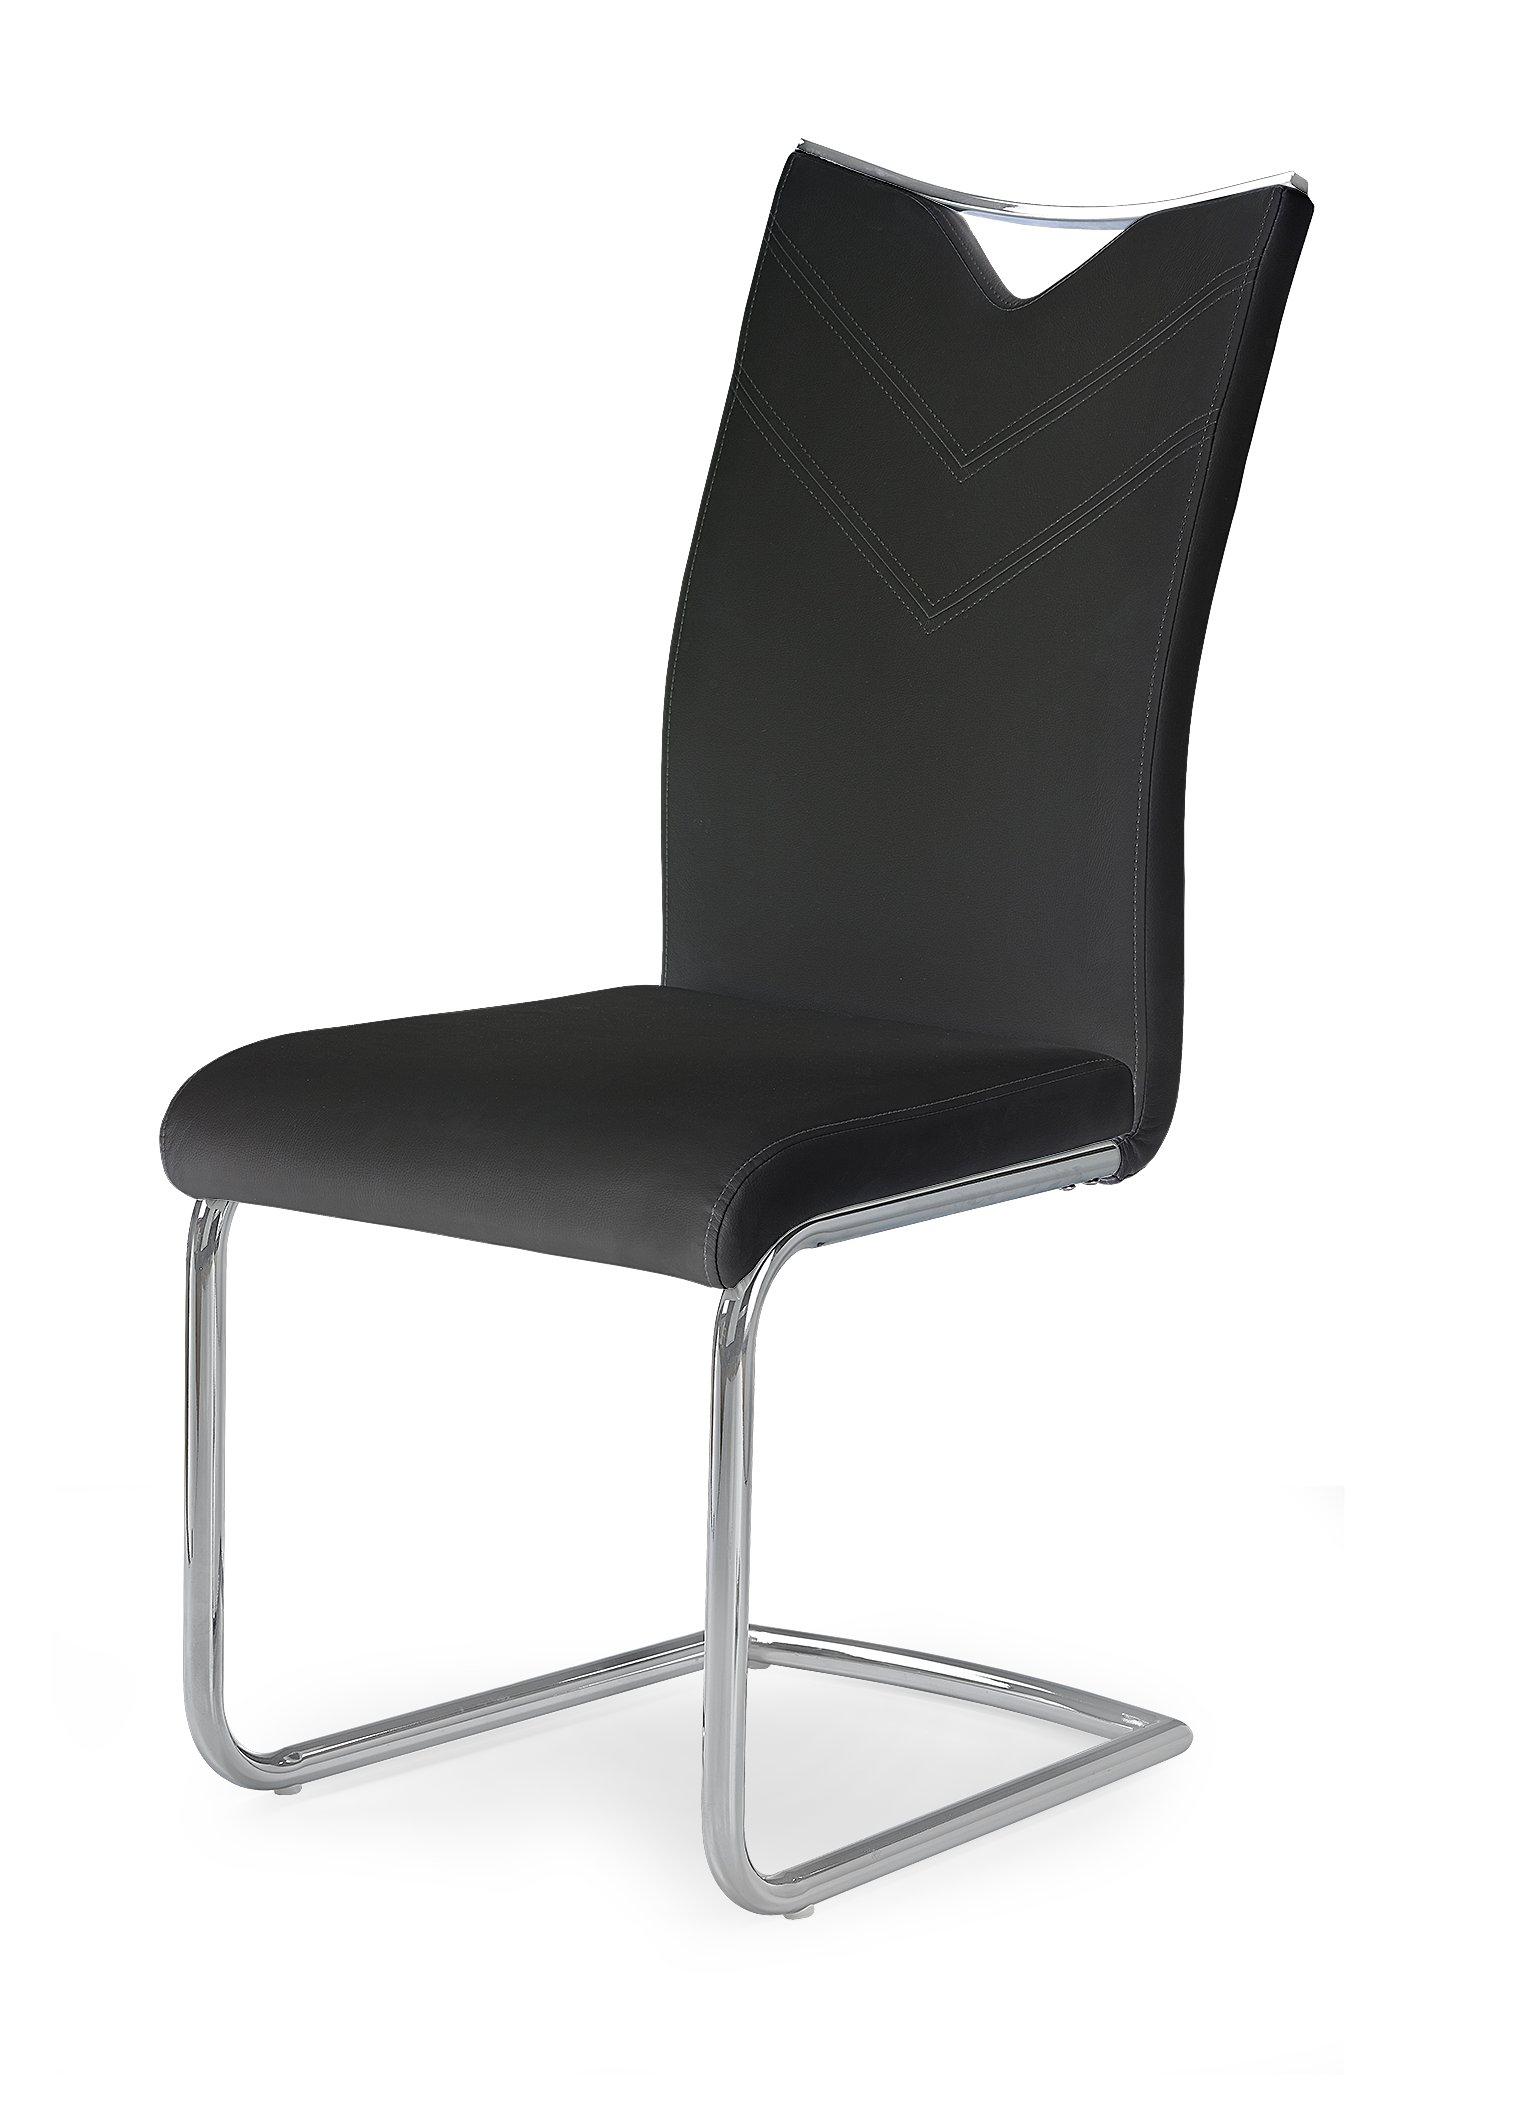 K224 krzesło czarny (1p=4szt) - COPY